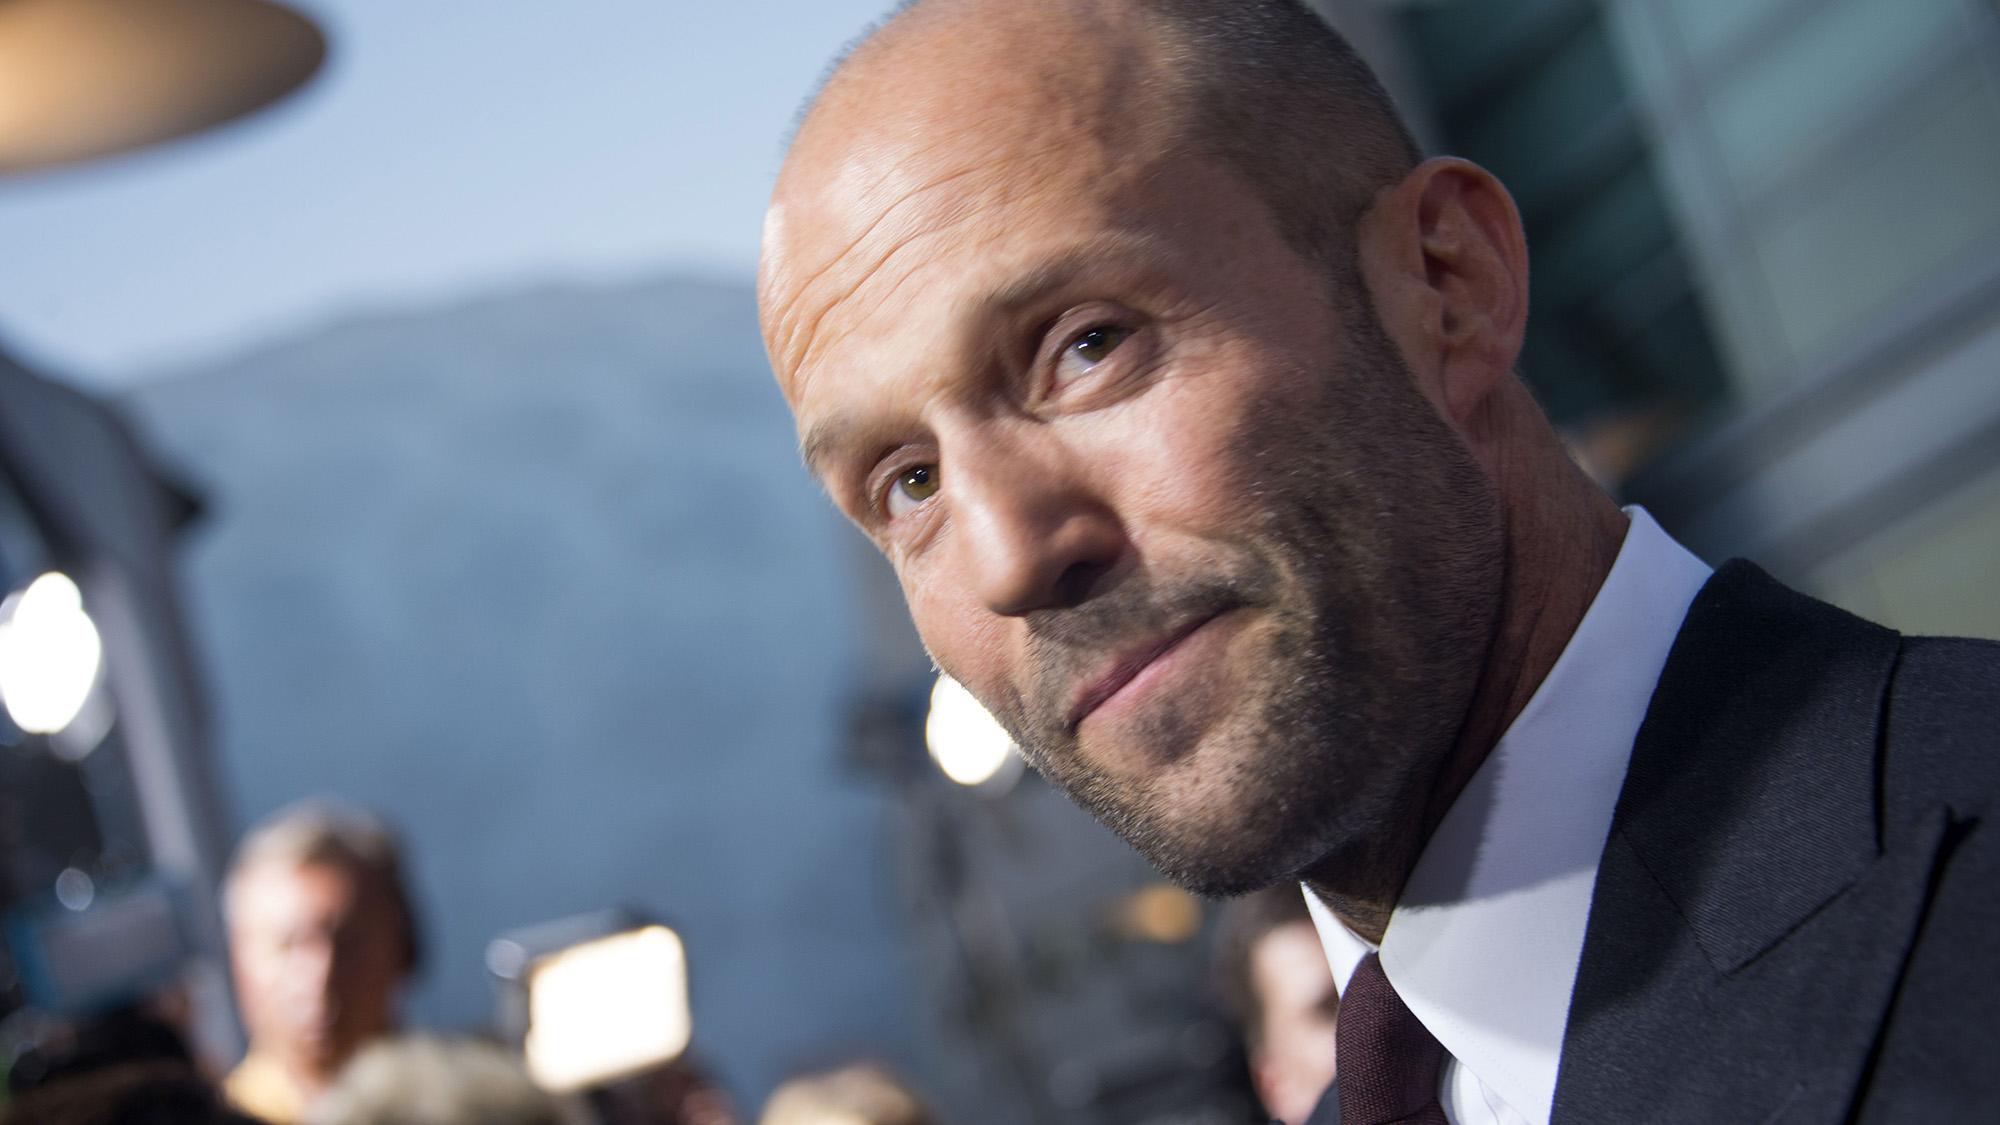 WATCH: Jason Statham i...